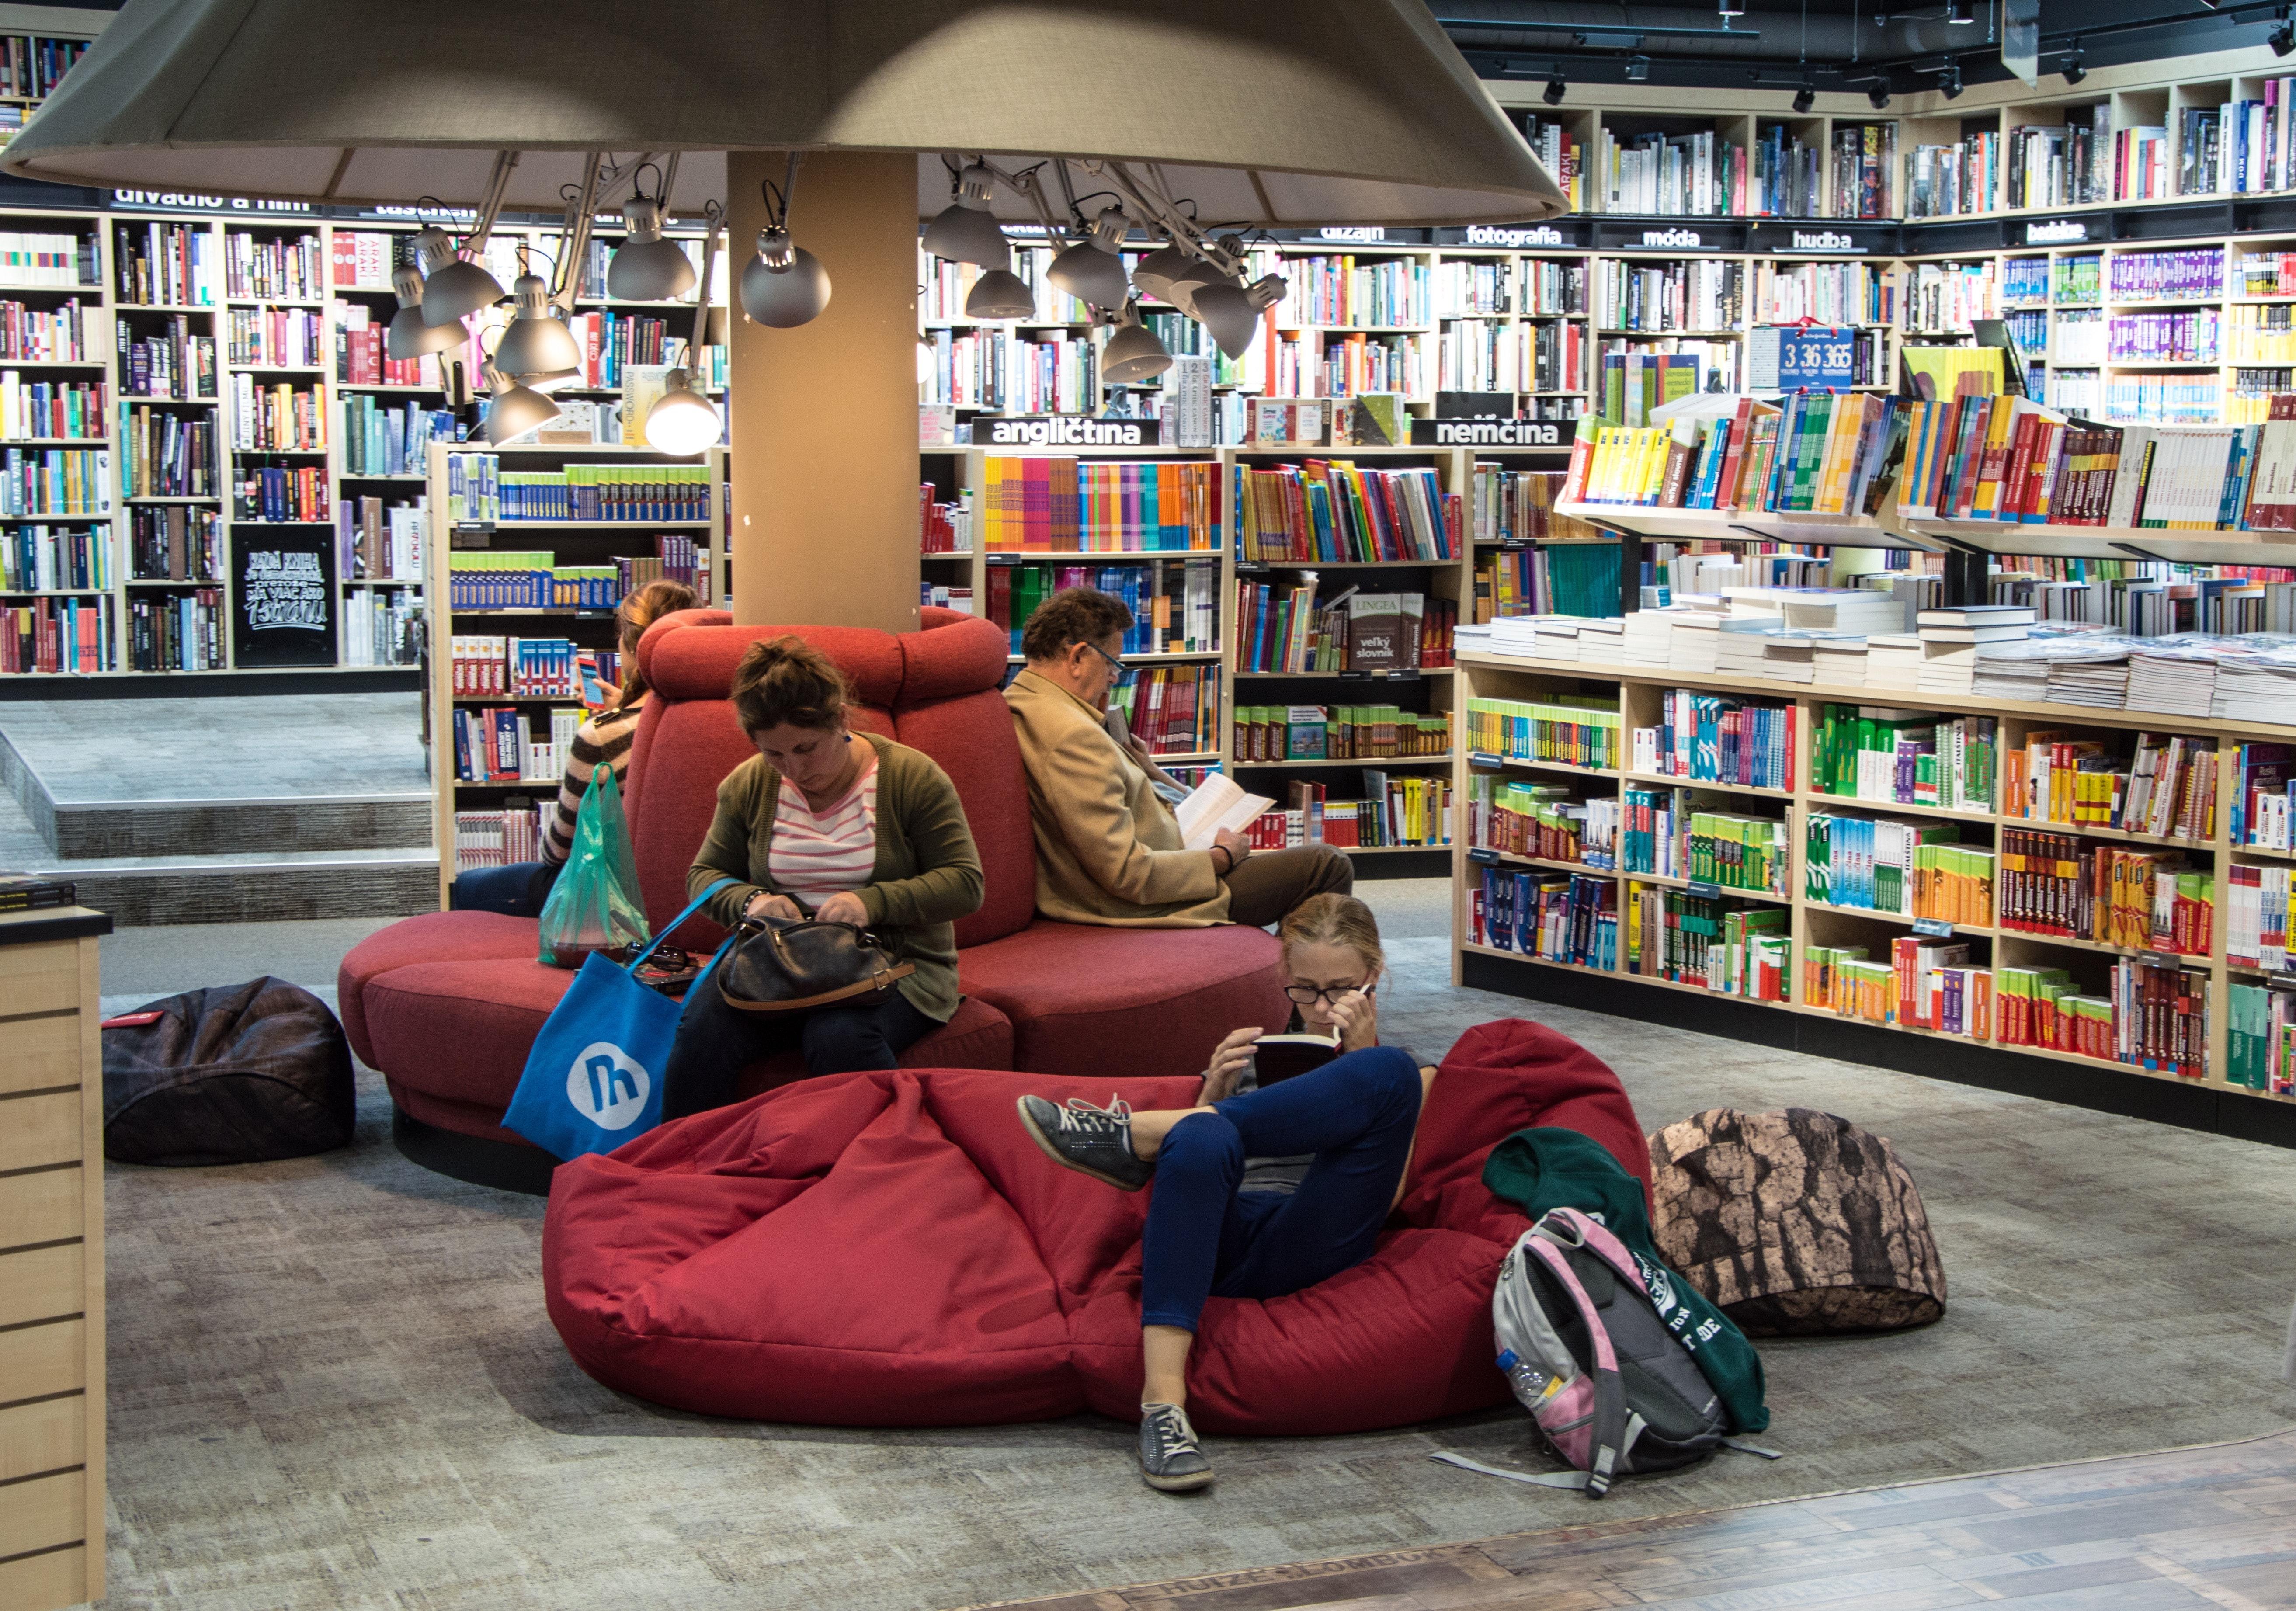 Full Length of Man Sitting on Floor, Backpack, Reader, Sofa, Sitting, HQ Photo